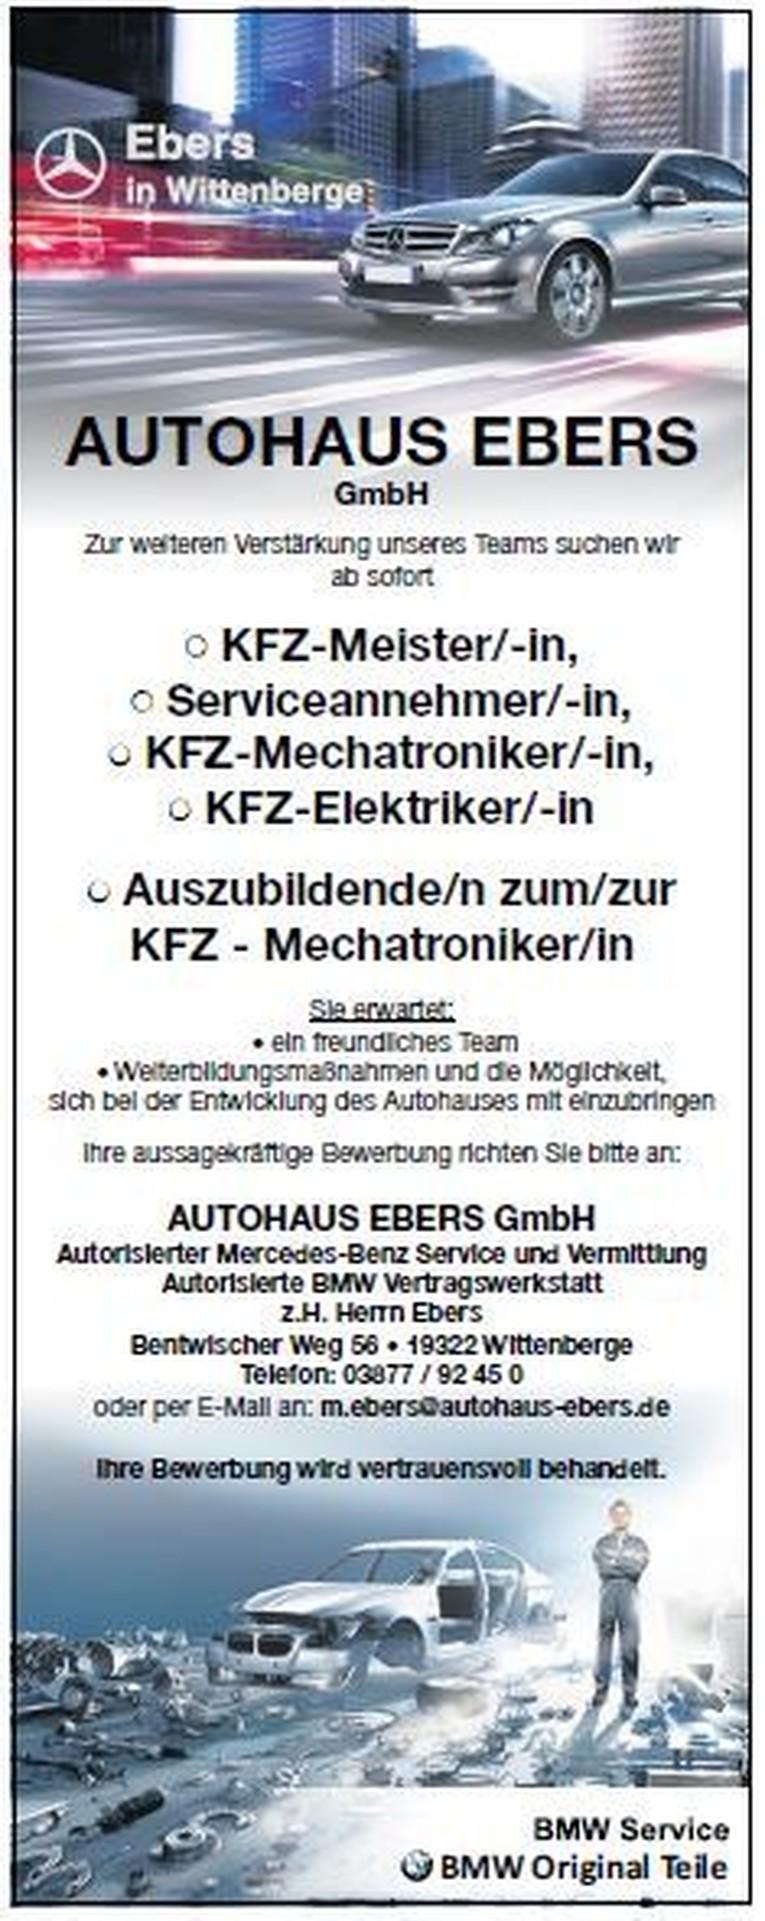 • KFZ-Meister/-in, • Serviceannehmer/-in, • KFZ-Mechatroniker/-in, • KFZ-Elektriker/-in • Auszubildende/n zum/zur KFZ - Mechatroniker/in